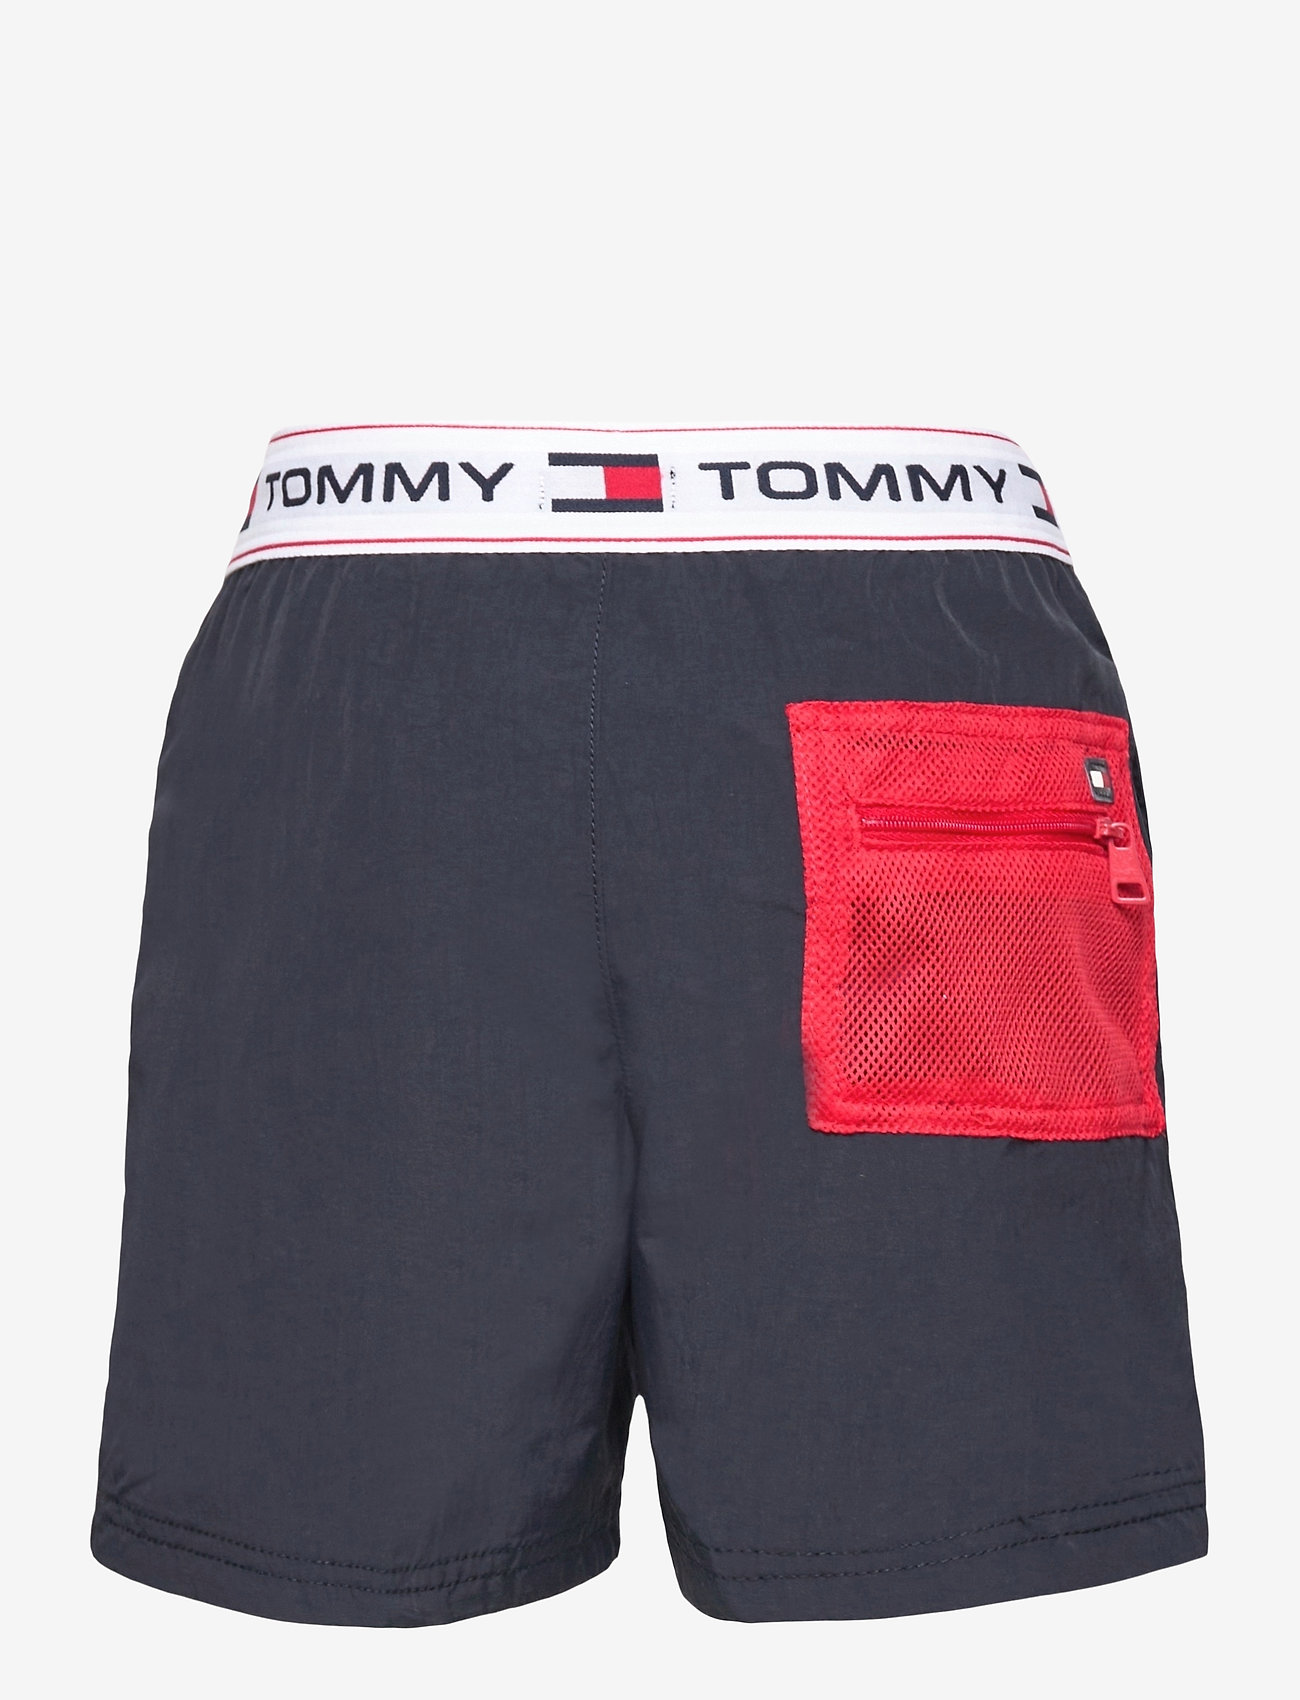 Tommy Hilfiger - MEDIUM DRAWSTRING - zwembroeken - desert sky - 1